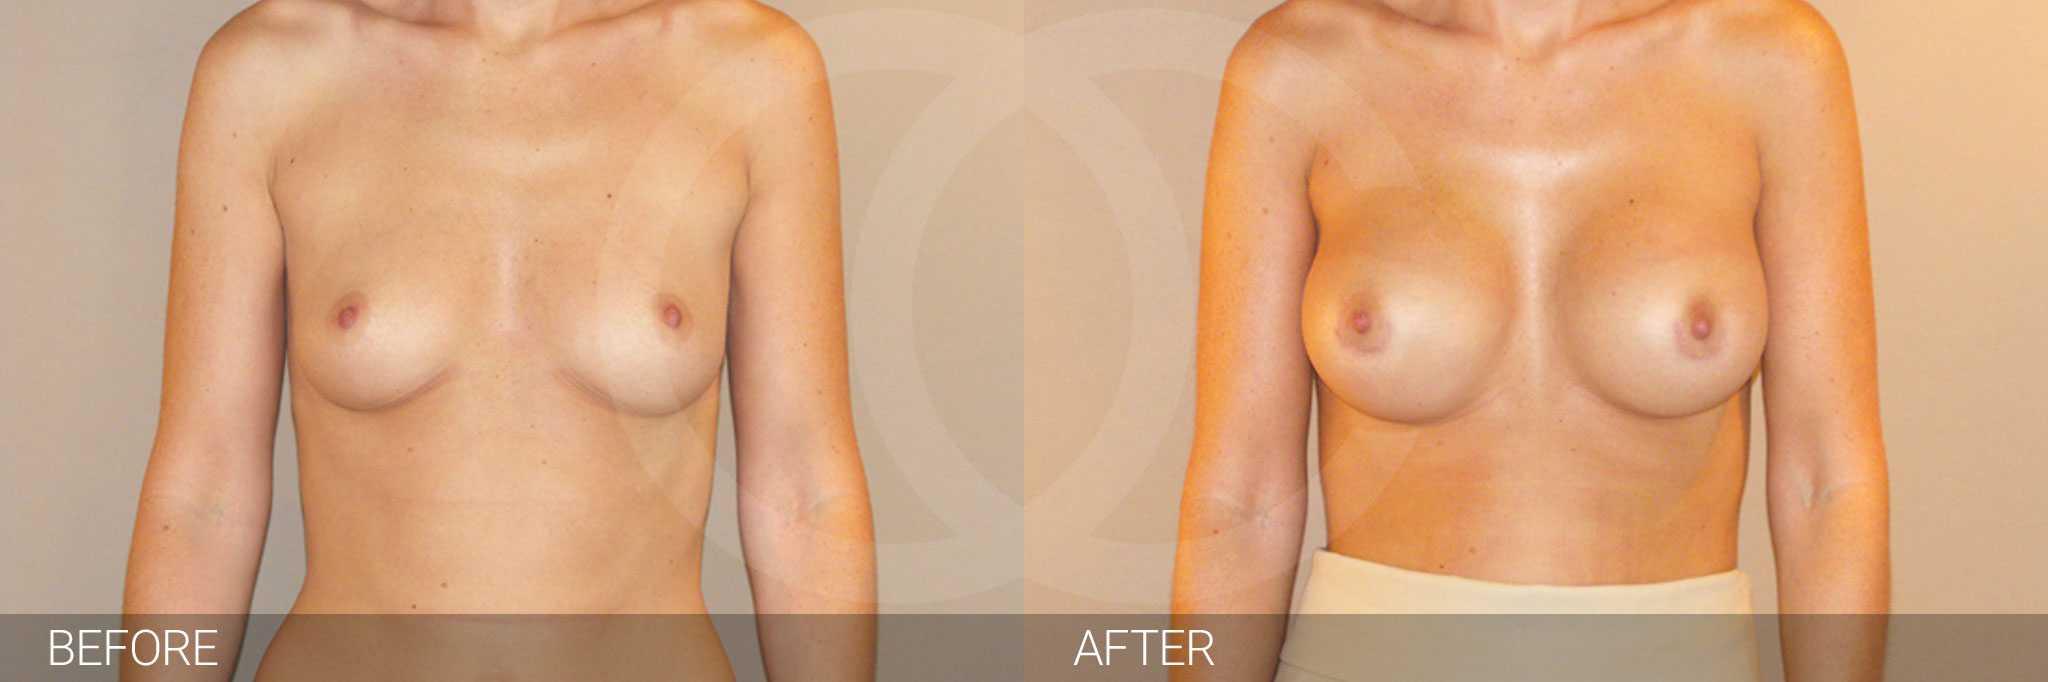 Augmentation mammaire Prothèses silicone position sous-glandulaire ante/post-op I